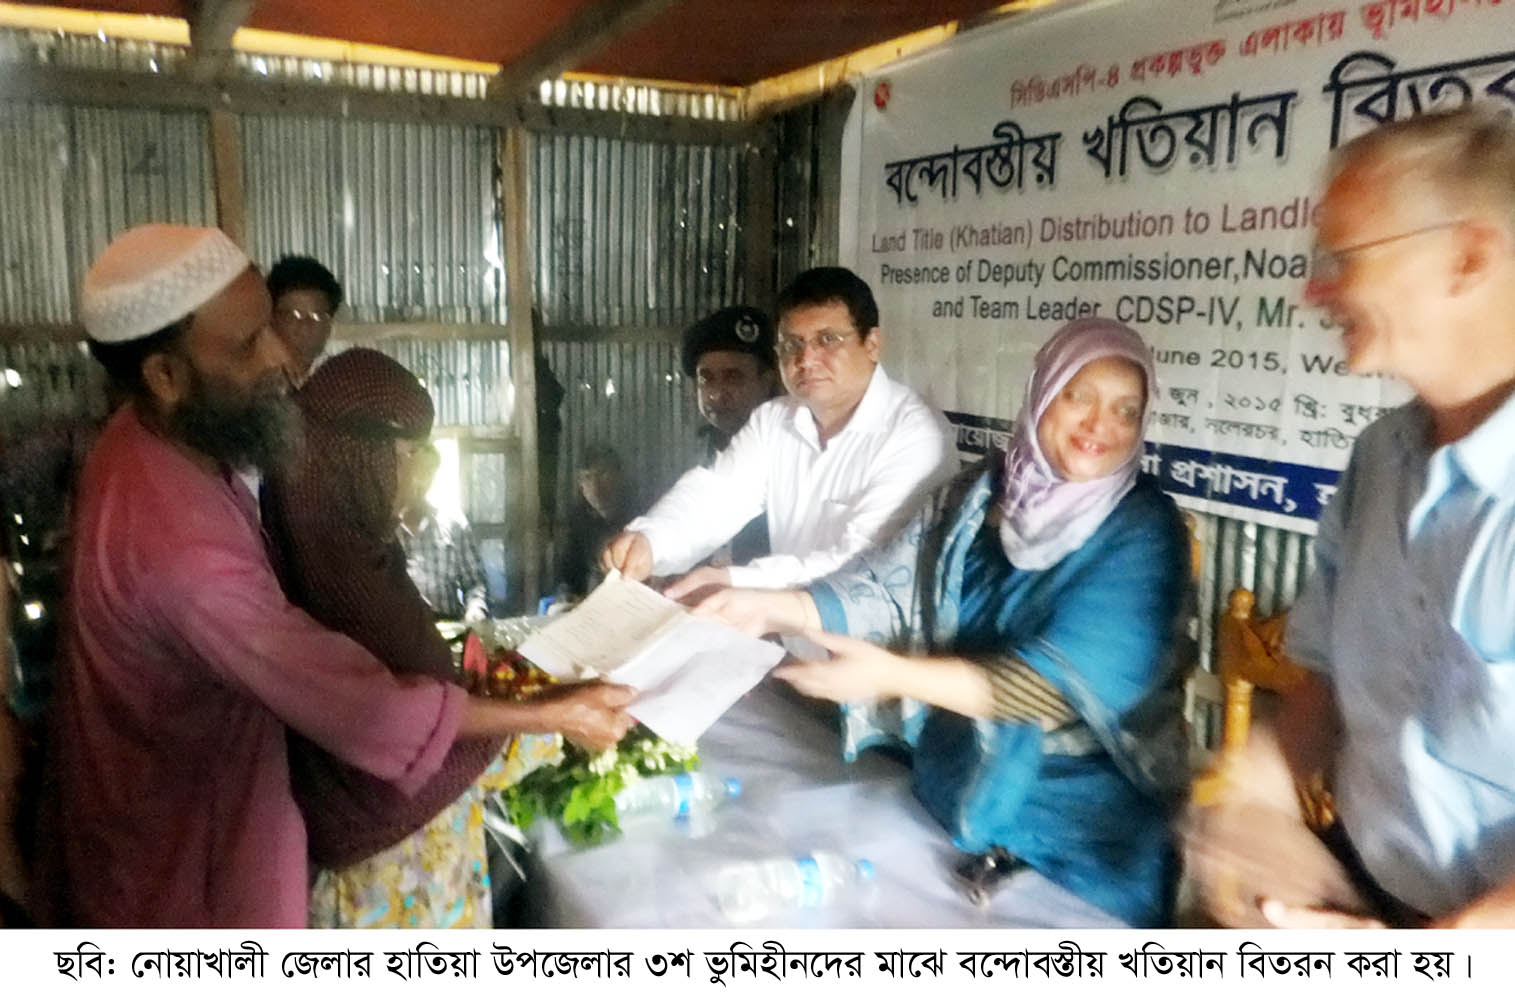 Noakhali CDSP News 17-06-2015 (1) Images